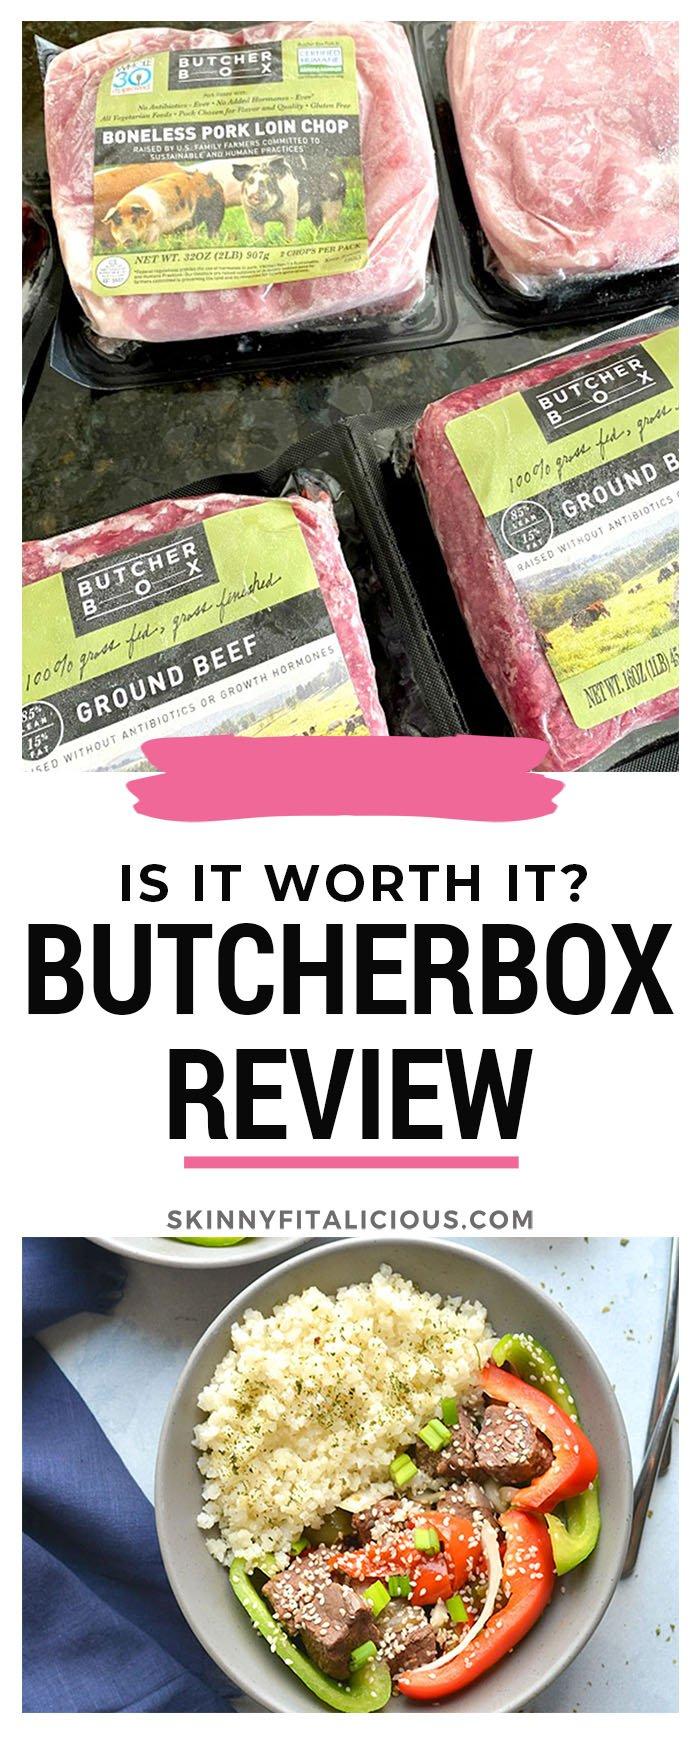 Is ButcherBox Worth It?